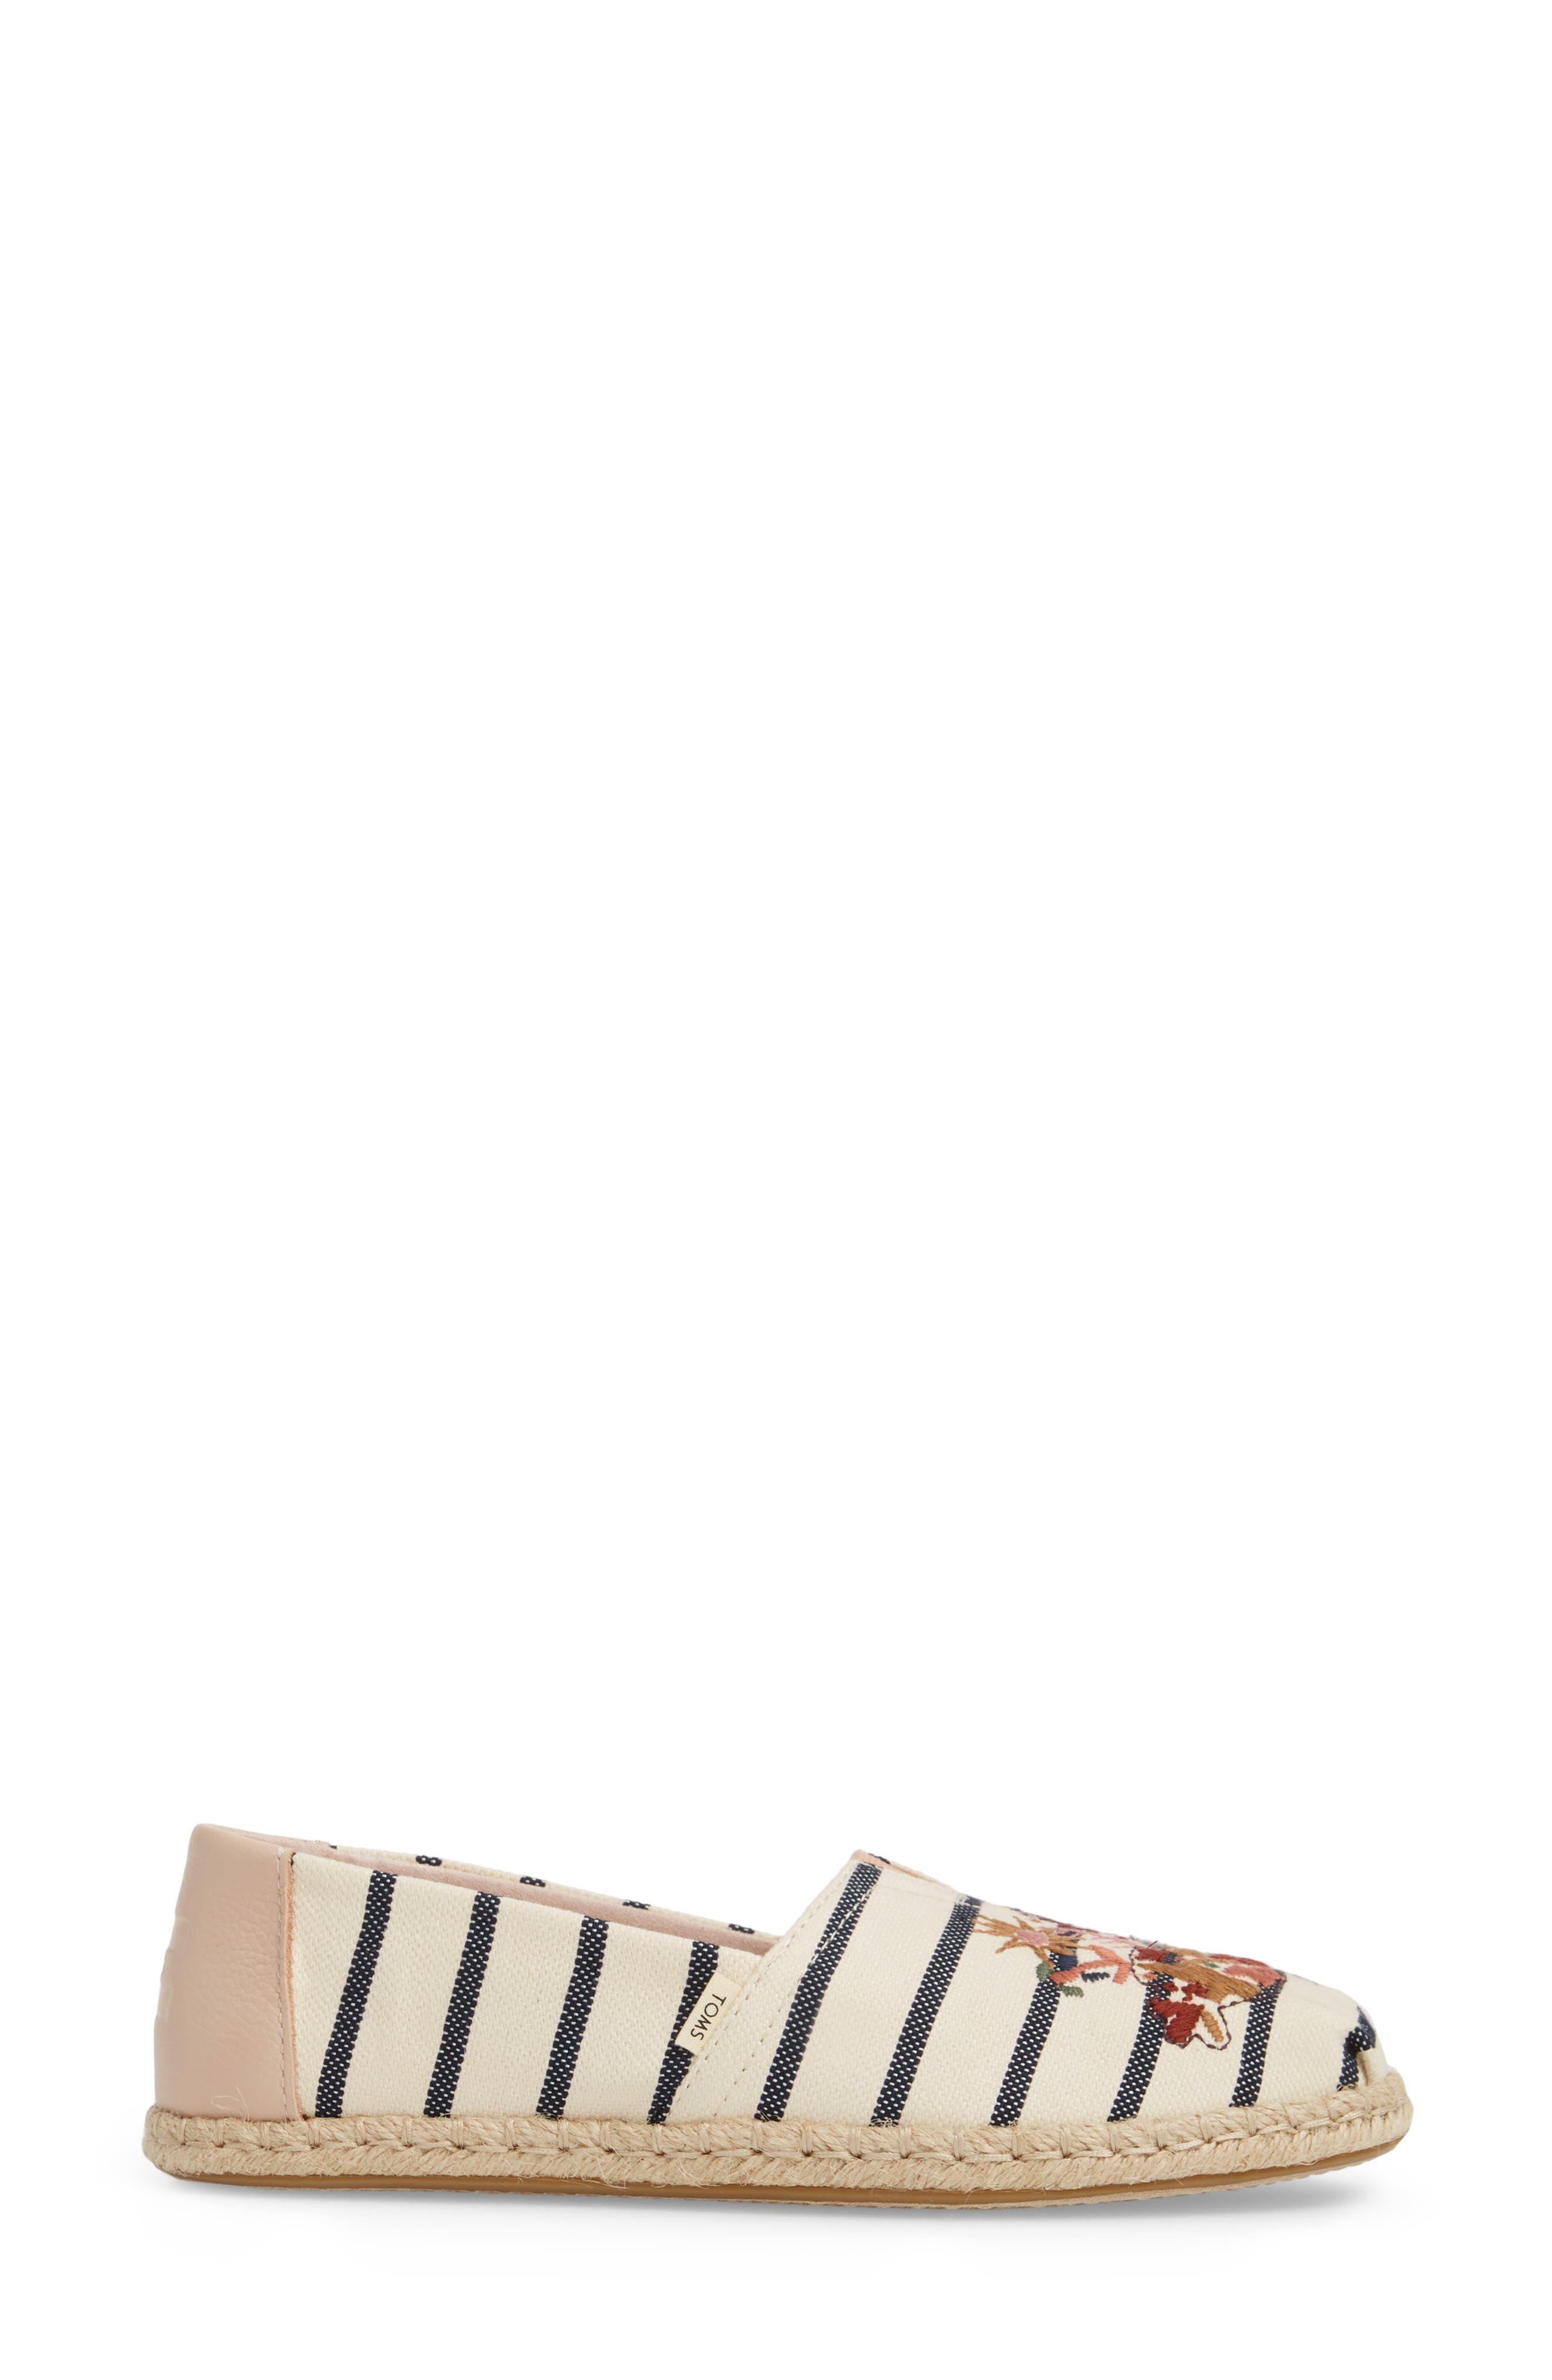 Alpargata Stripe Espadrille,                             Alternate thumbnail 6, color,                             Floral Embroidery Woven Stripe